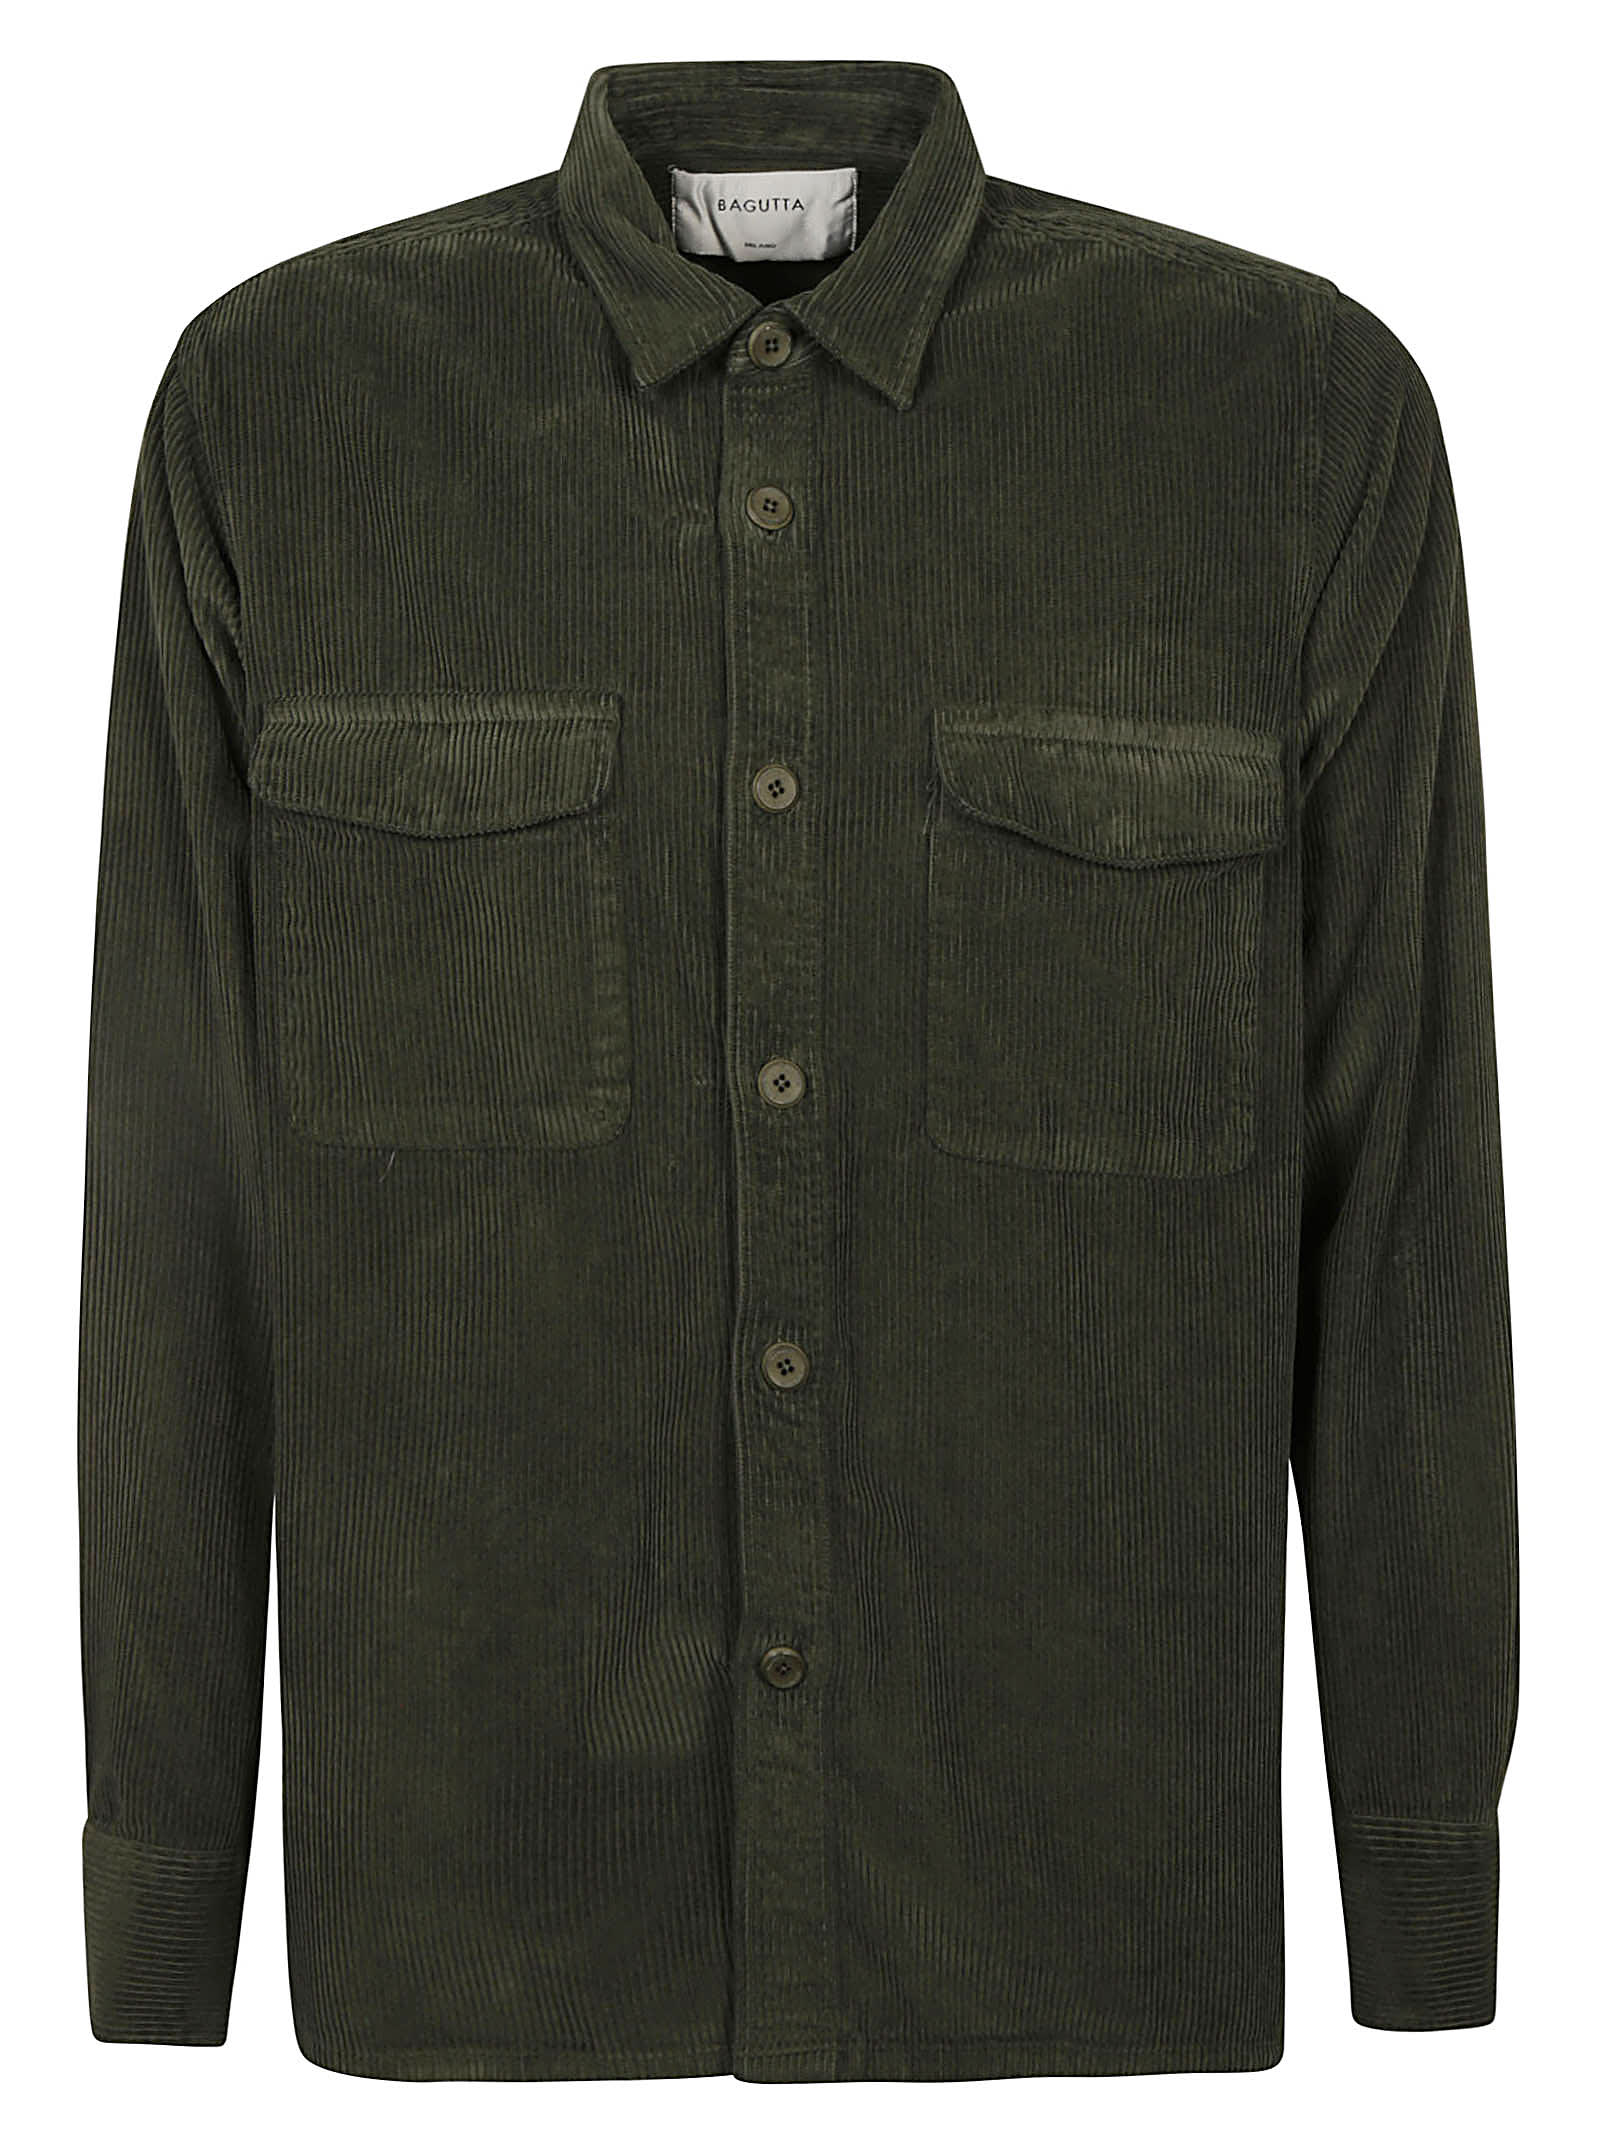 Cargo Pocket Long-sleeved Shirt